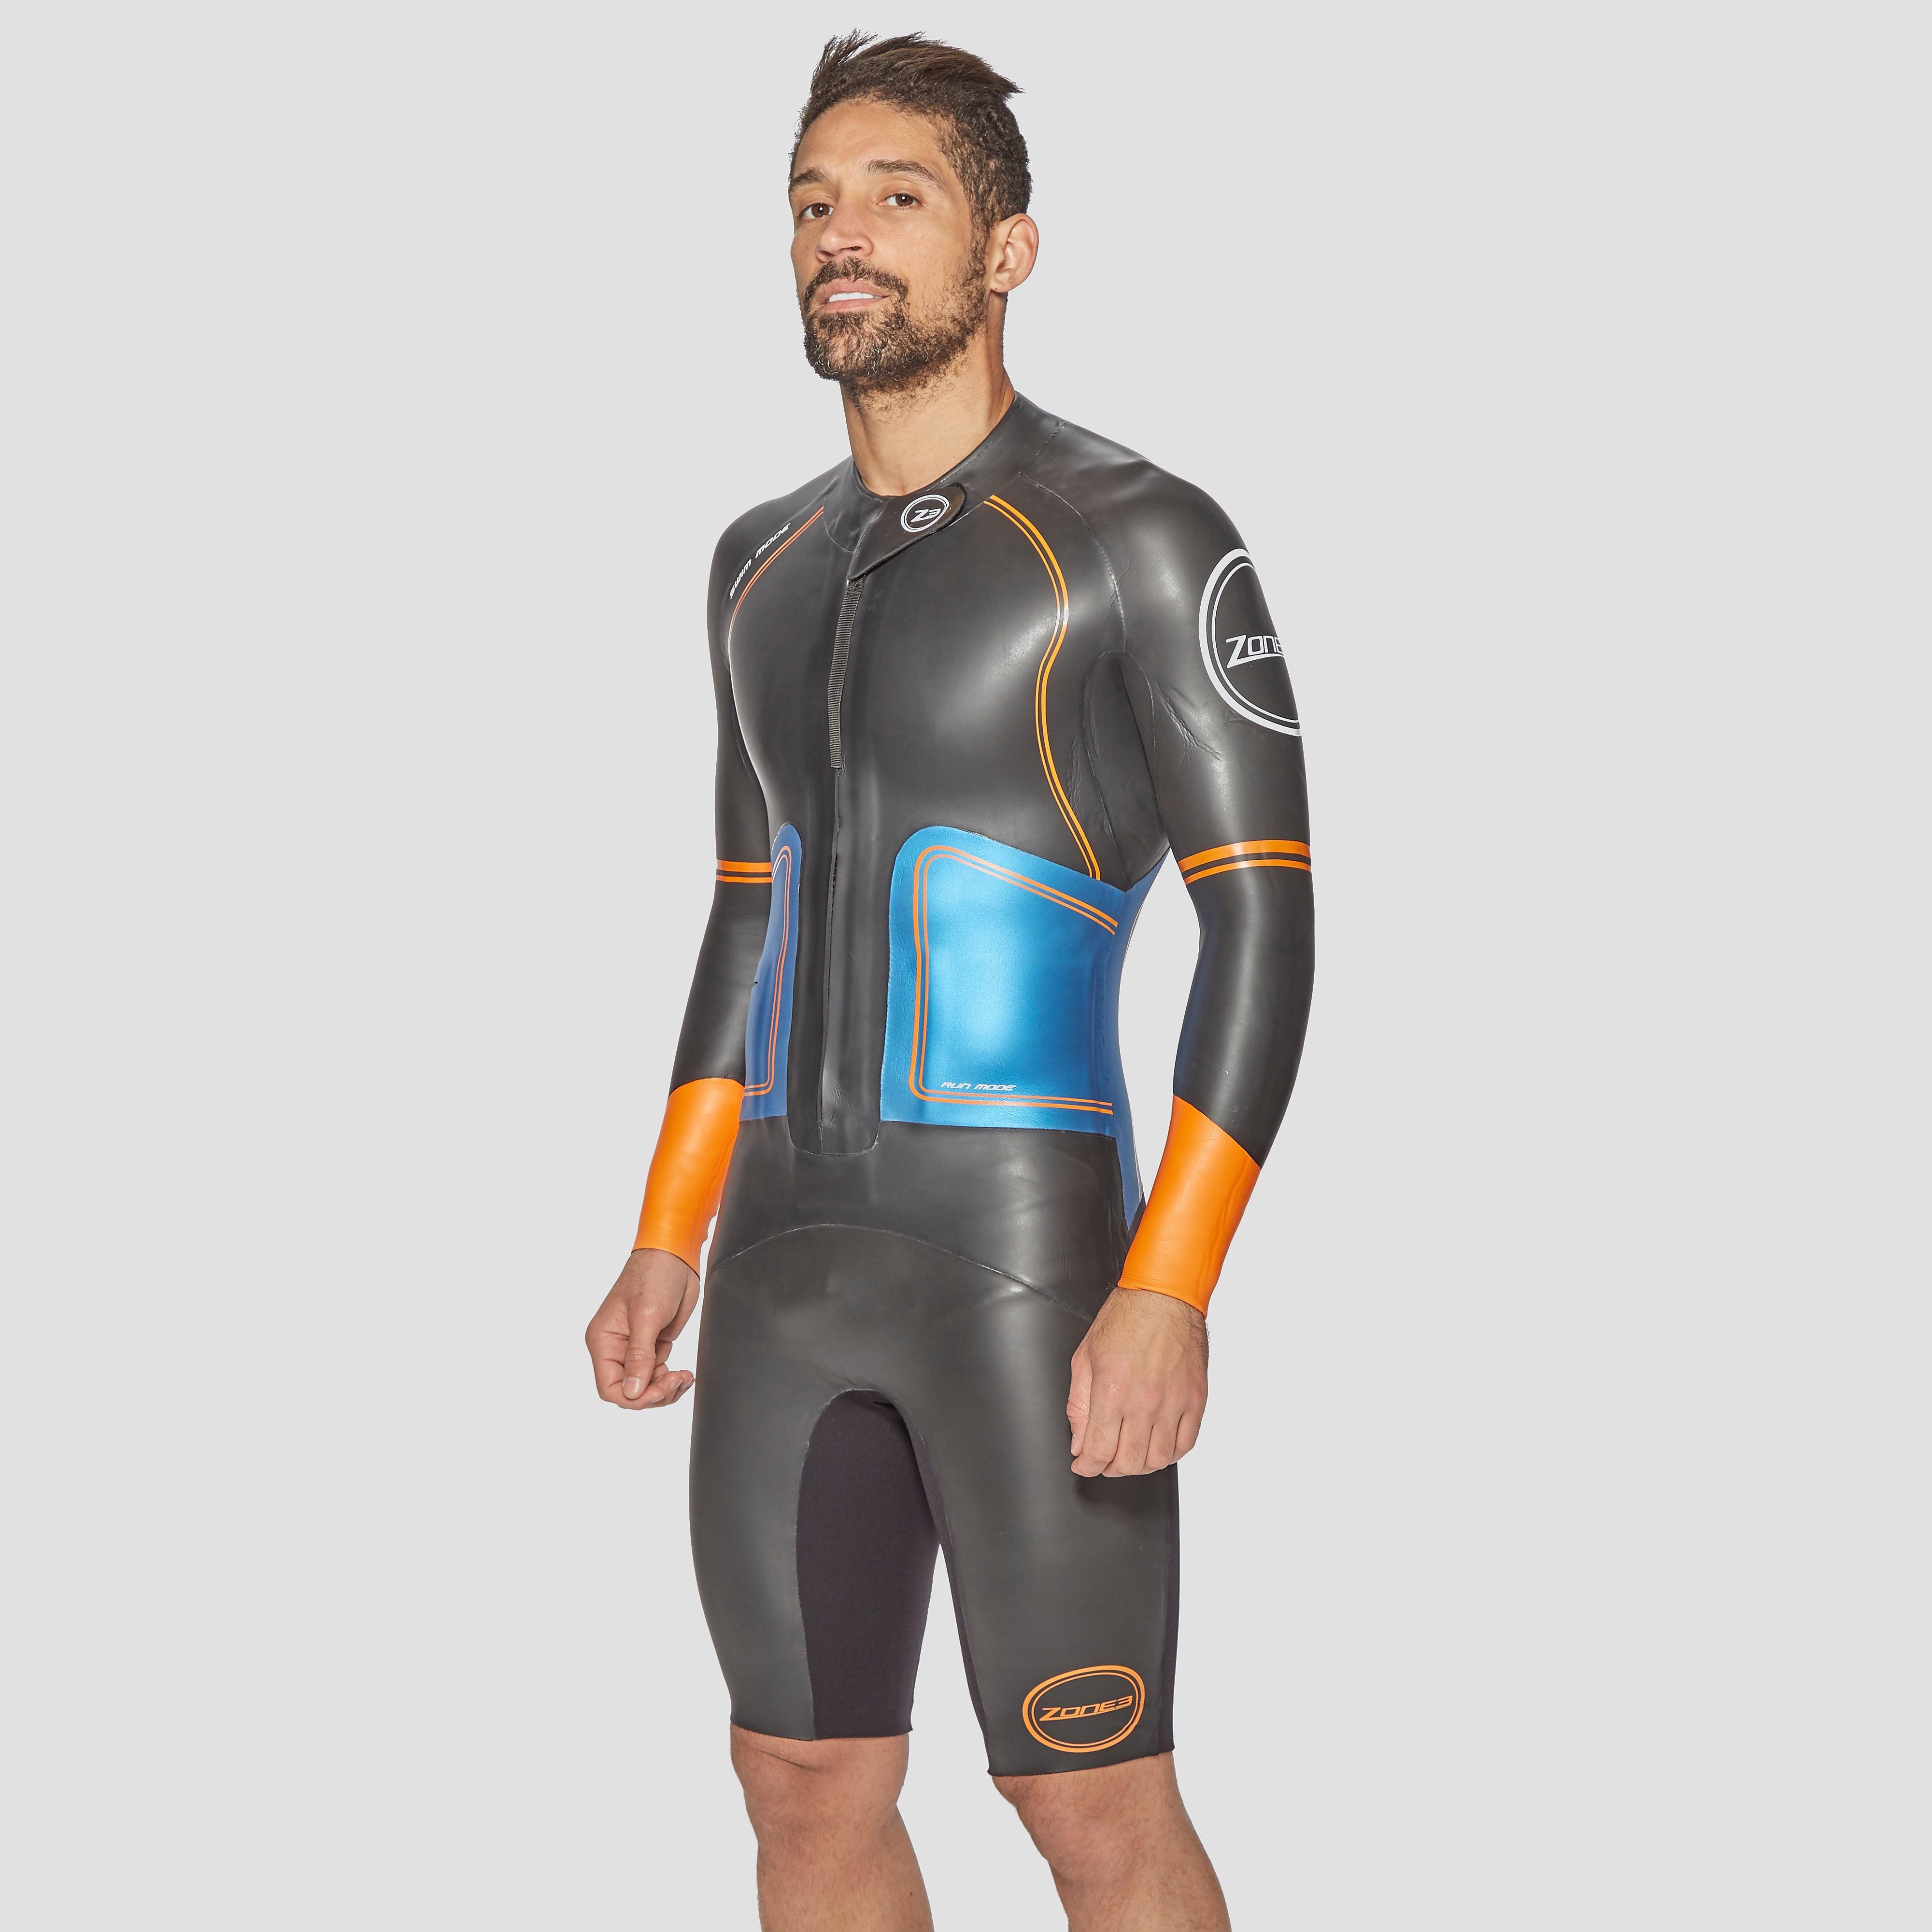 Zone 3 Evolution Swim Run Men's Wetsuit